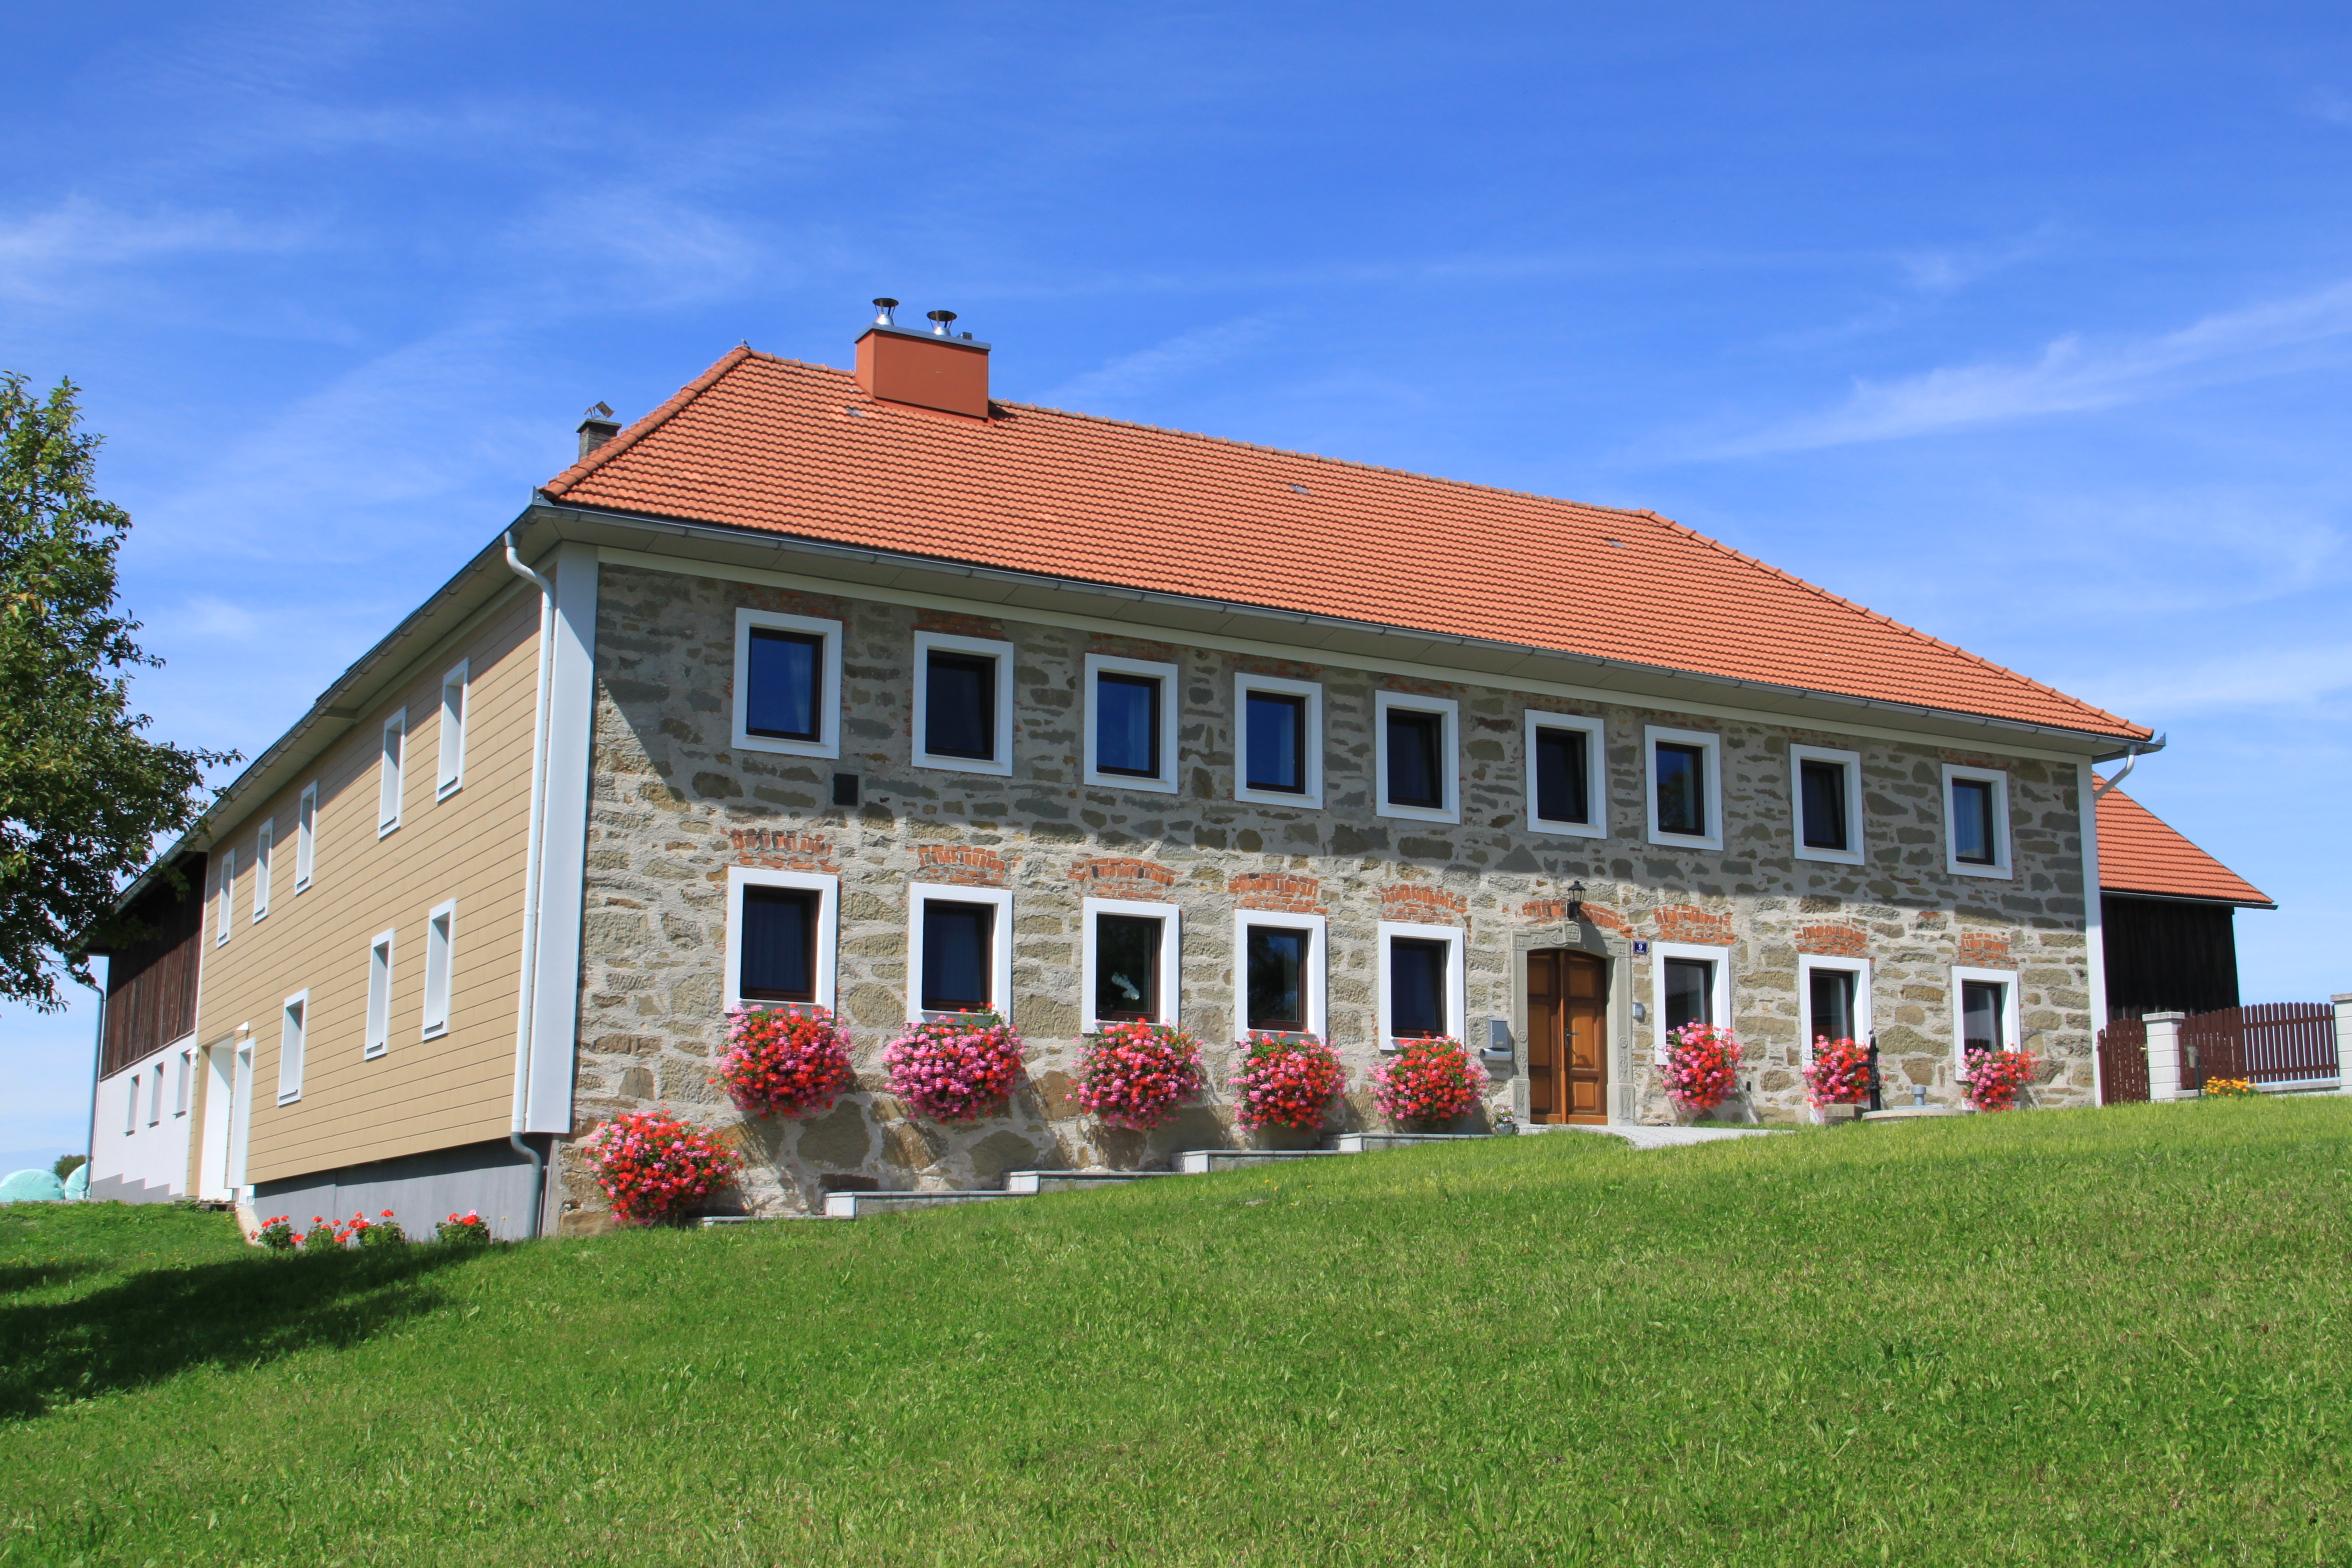 http://www.der-bauberater.at/wp-content/uploads/2017/10/Umbau-4kant-Bauernhof_01.jpg